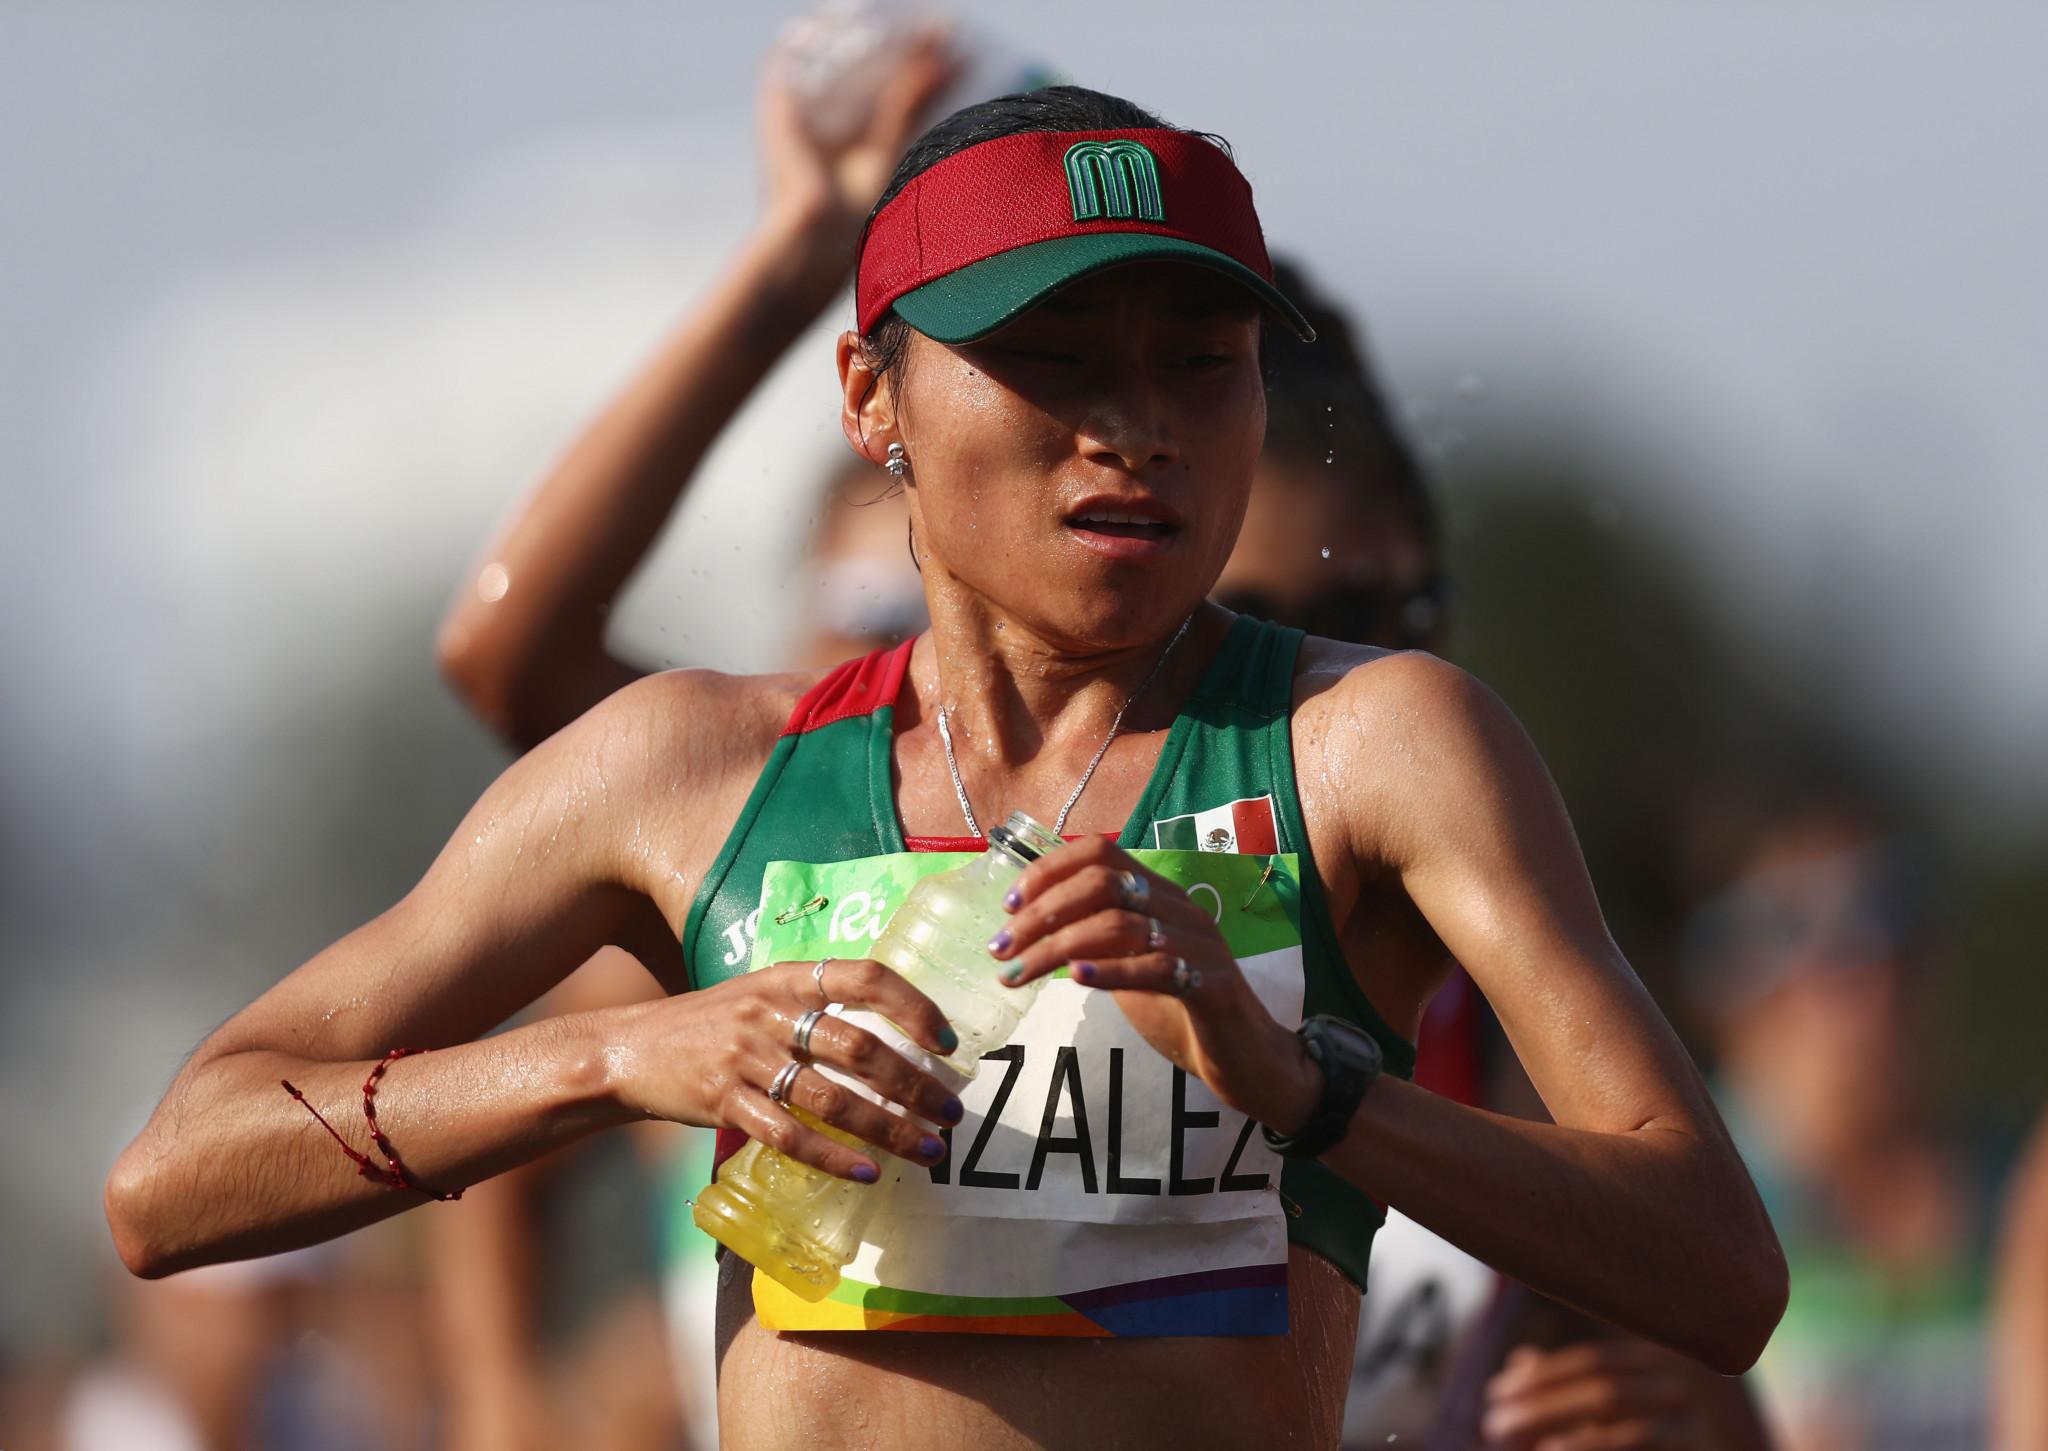 González dominates women's 20km event at IAAF Race Walking Challenge